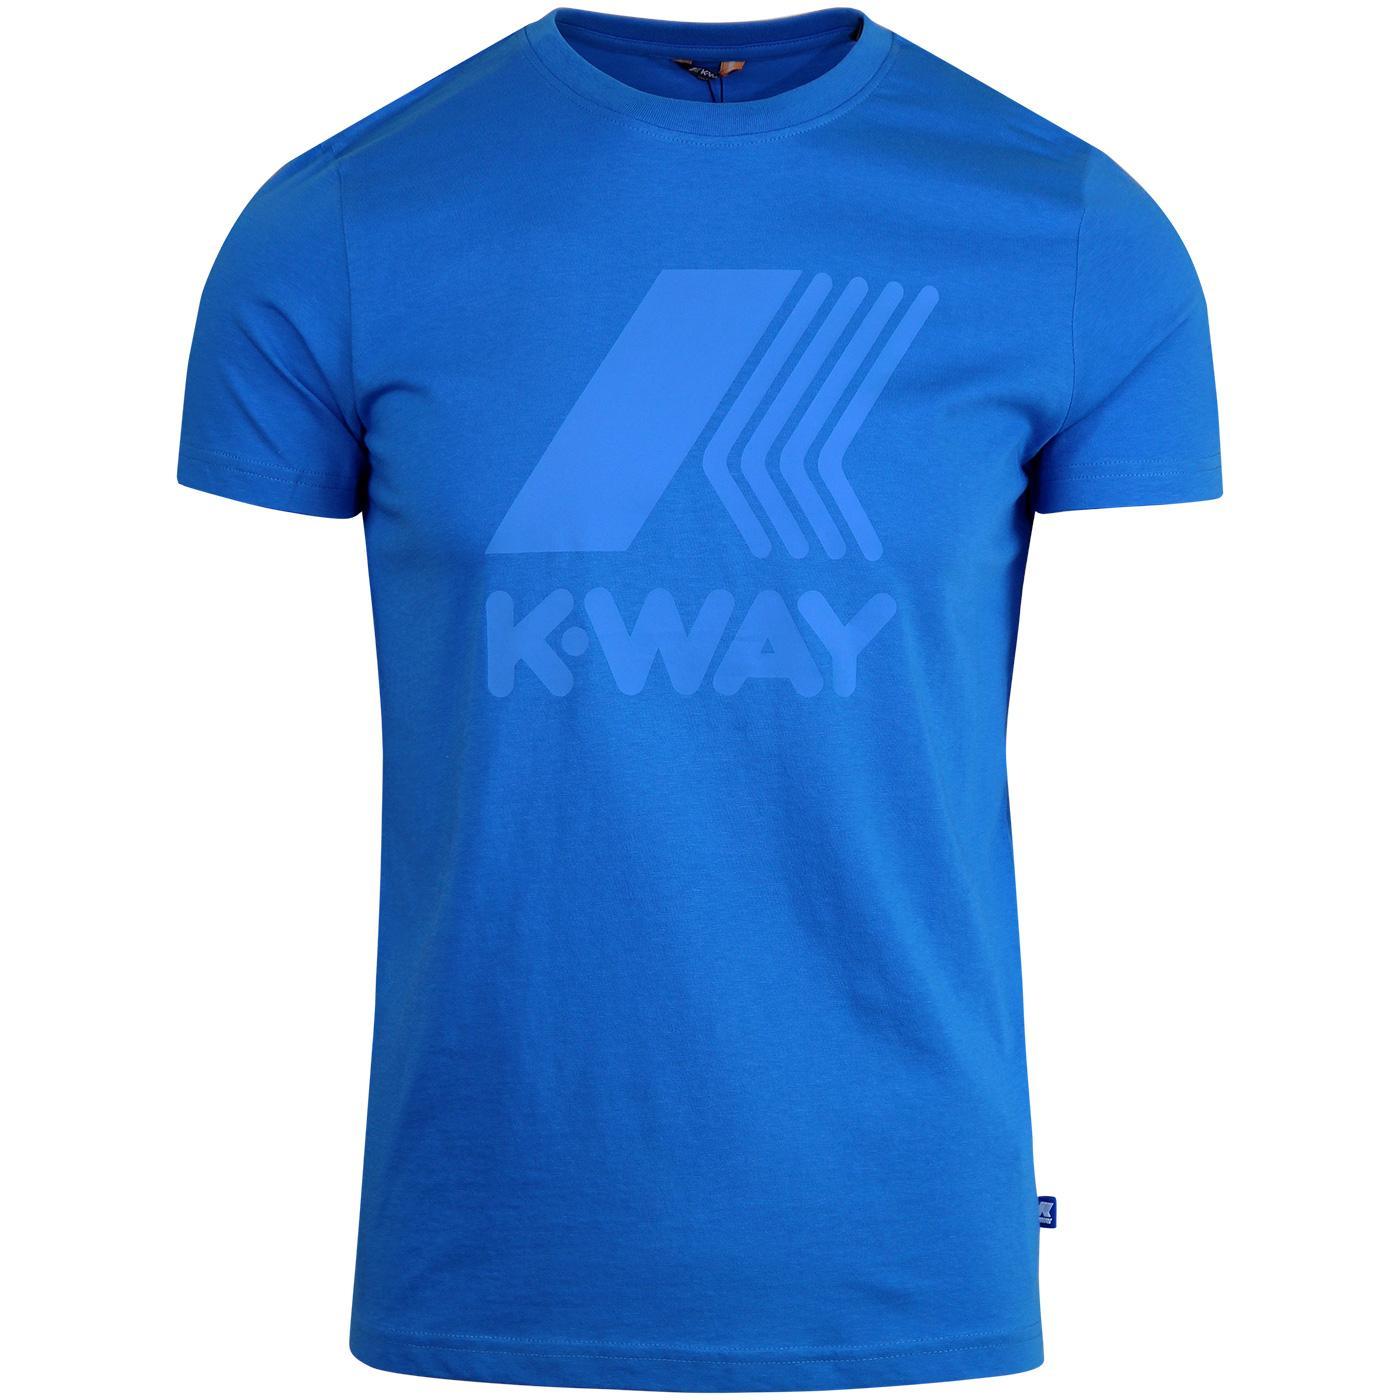 Elliot K-WAY Retro Macro Logo T-Shirt BLUE FRANCE